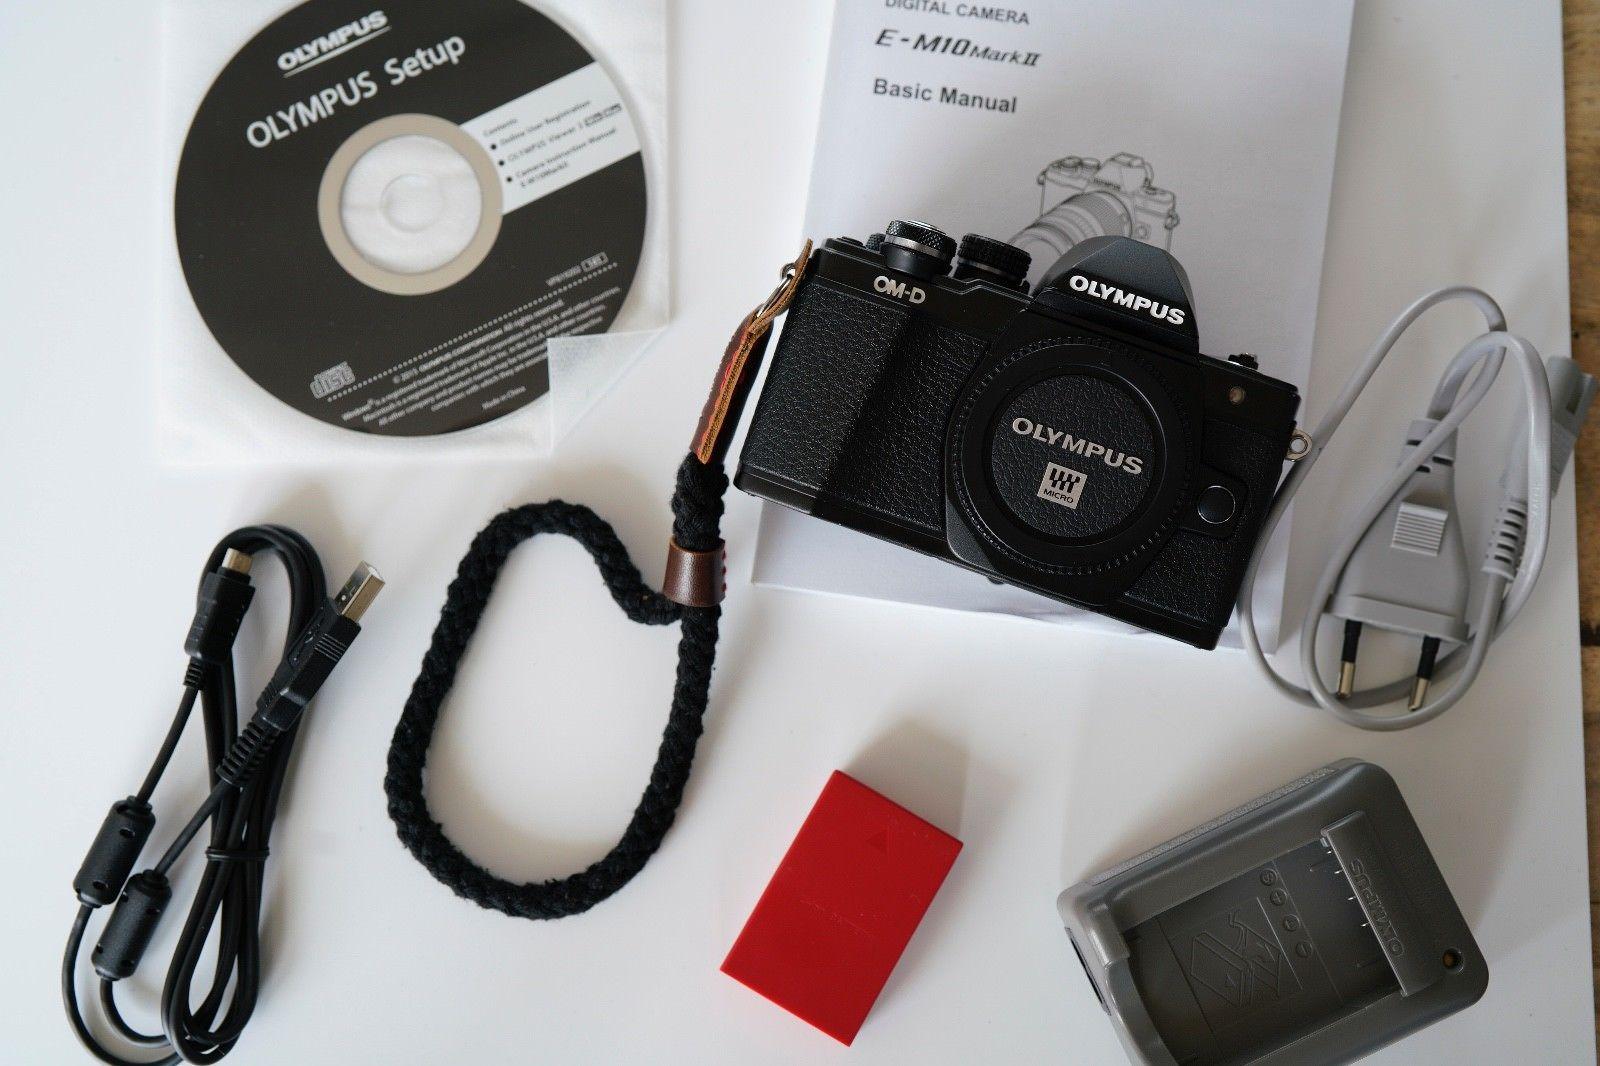 Olympus OM-D OM-D E-M10 Mark II Kamera nur 4093 Auslösungen *TOP*